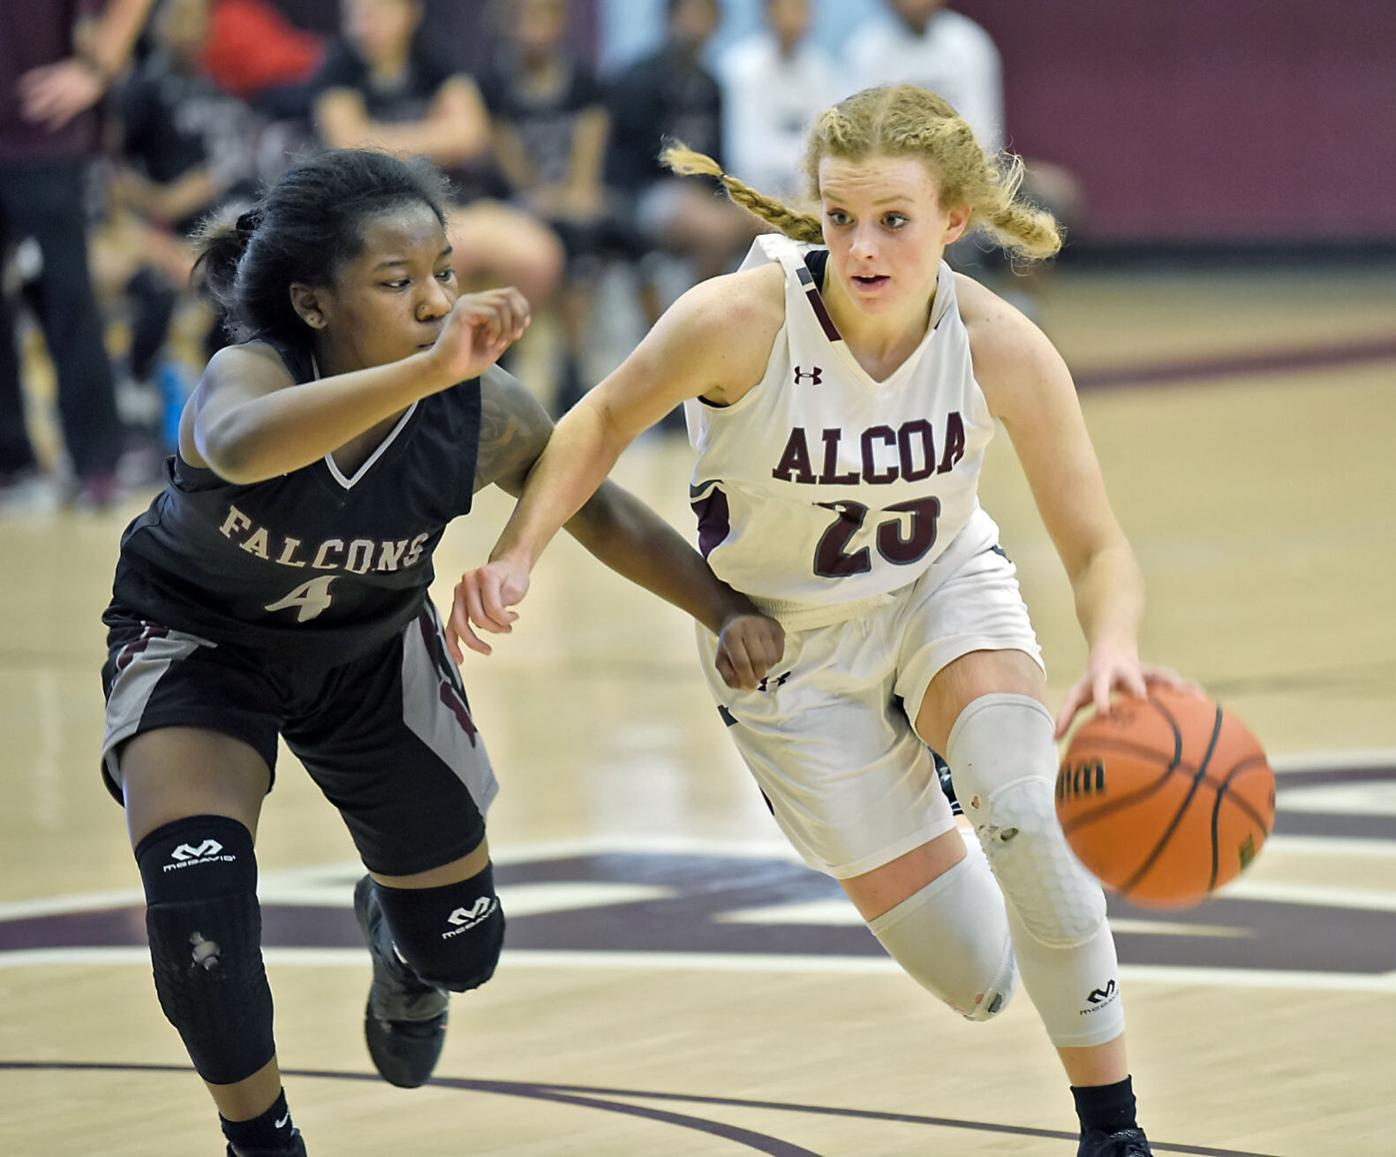 BASKETBALL: Alcoa's Karli Haworth vs Fulton